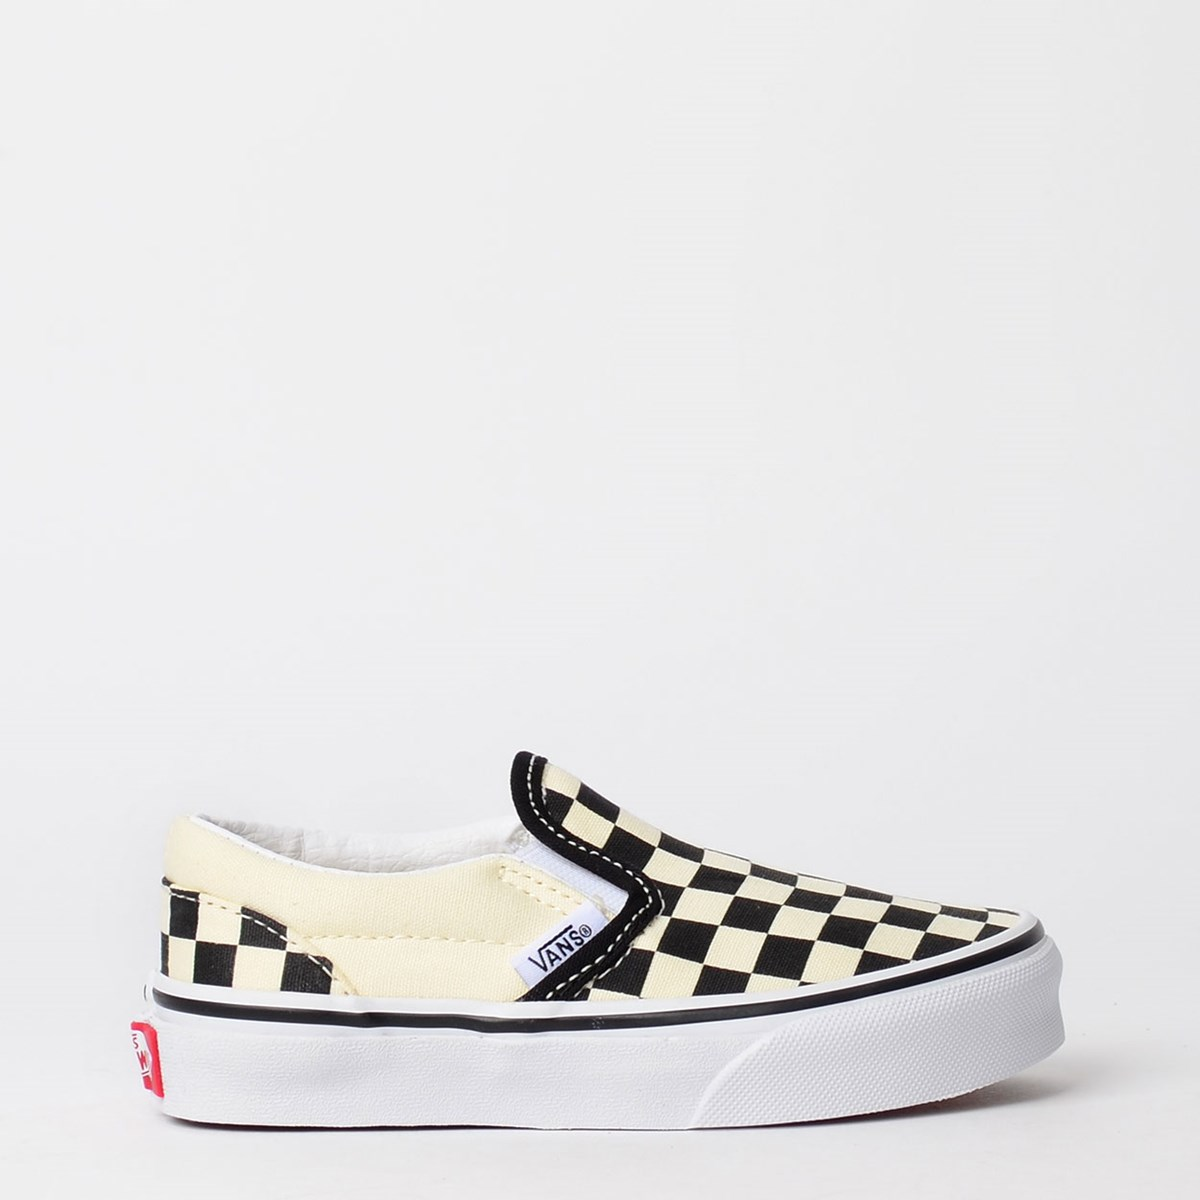 Tênis Vans Kids Classic Slip On Checkerboard Black White VN000ZBUEO1